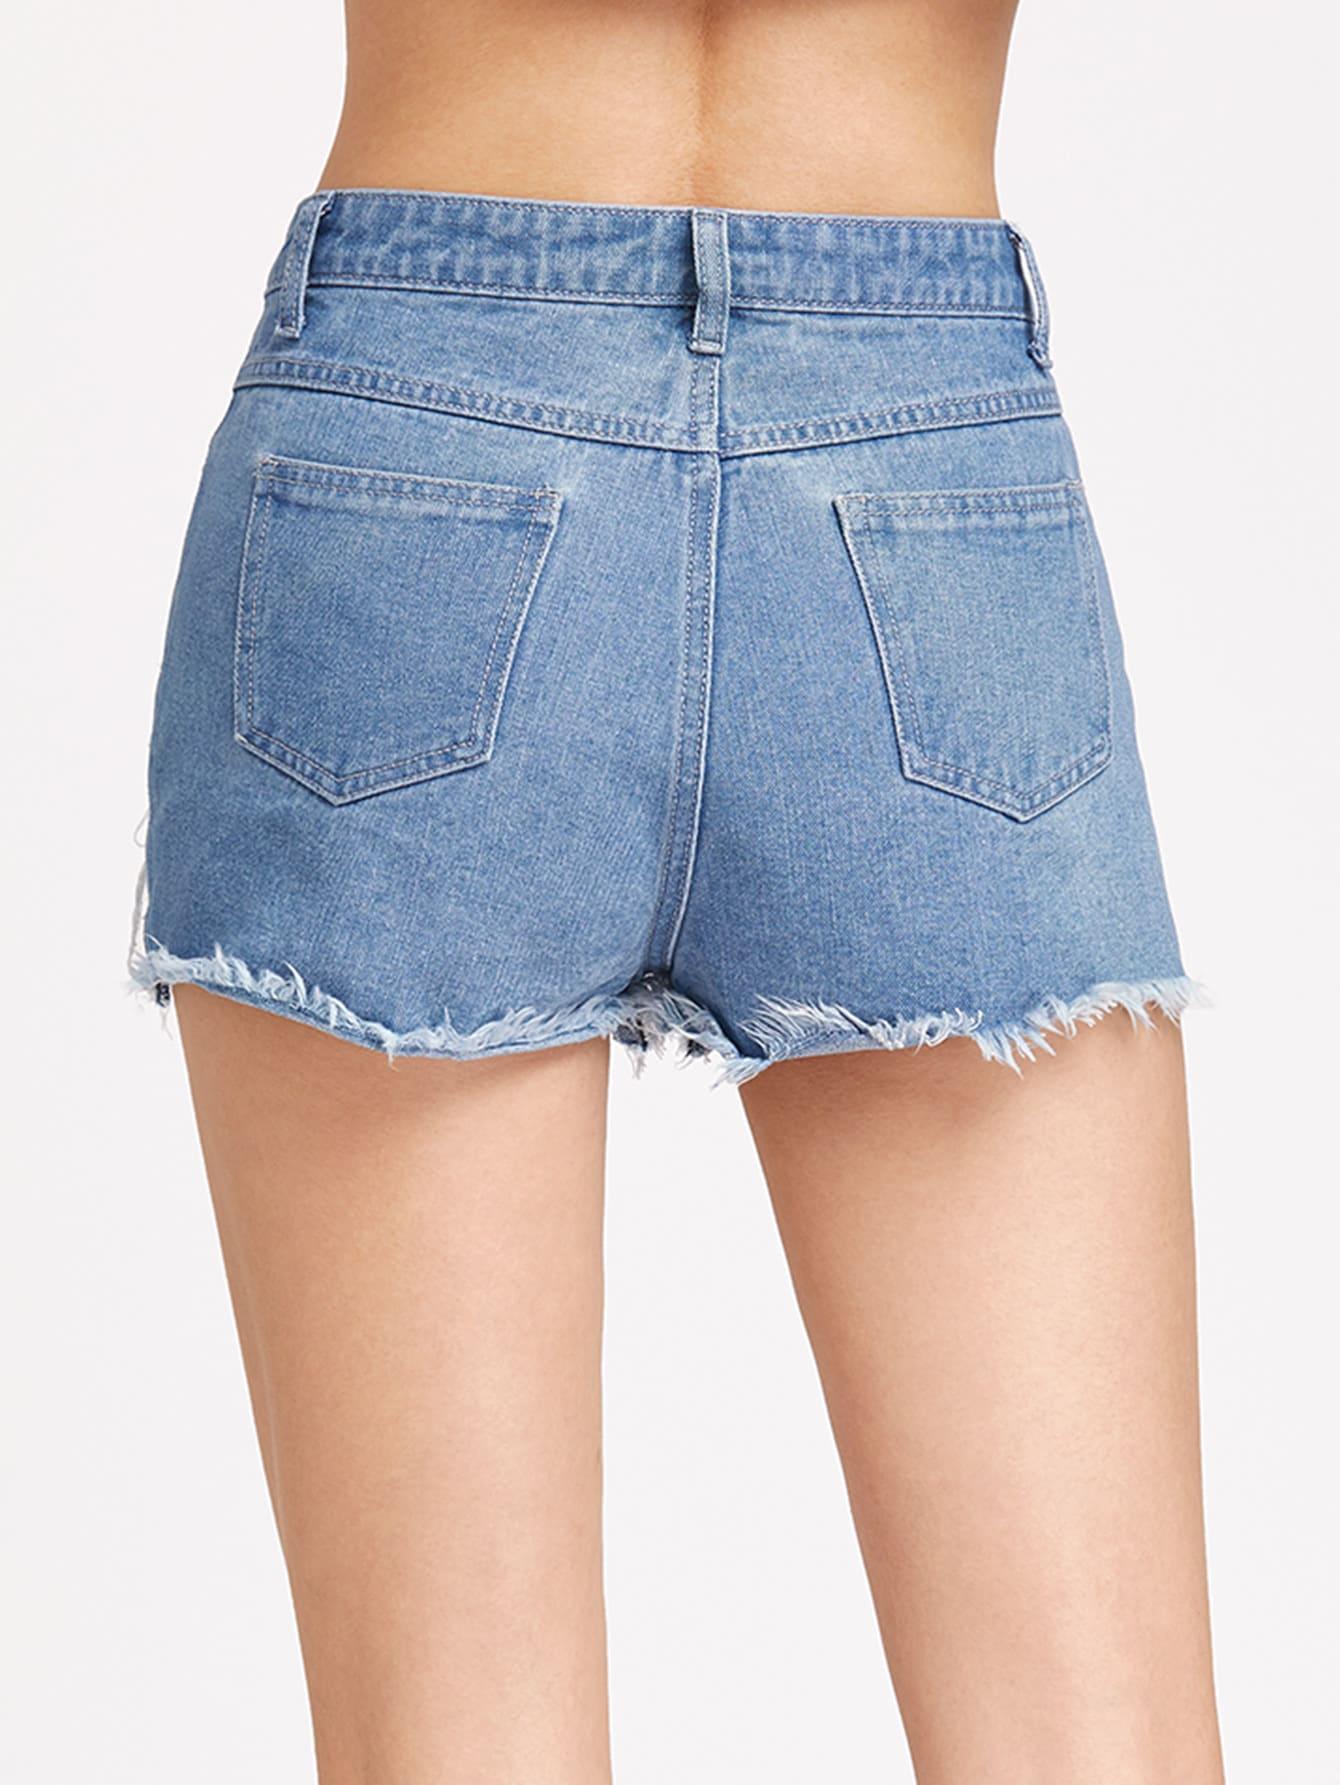 shorts170315450_2